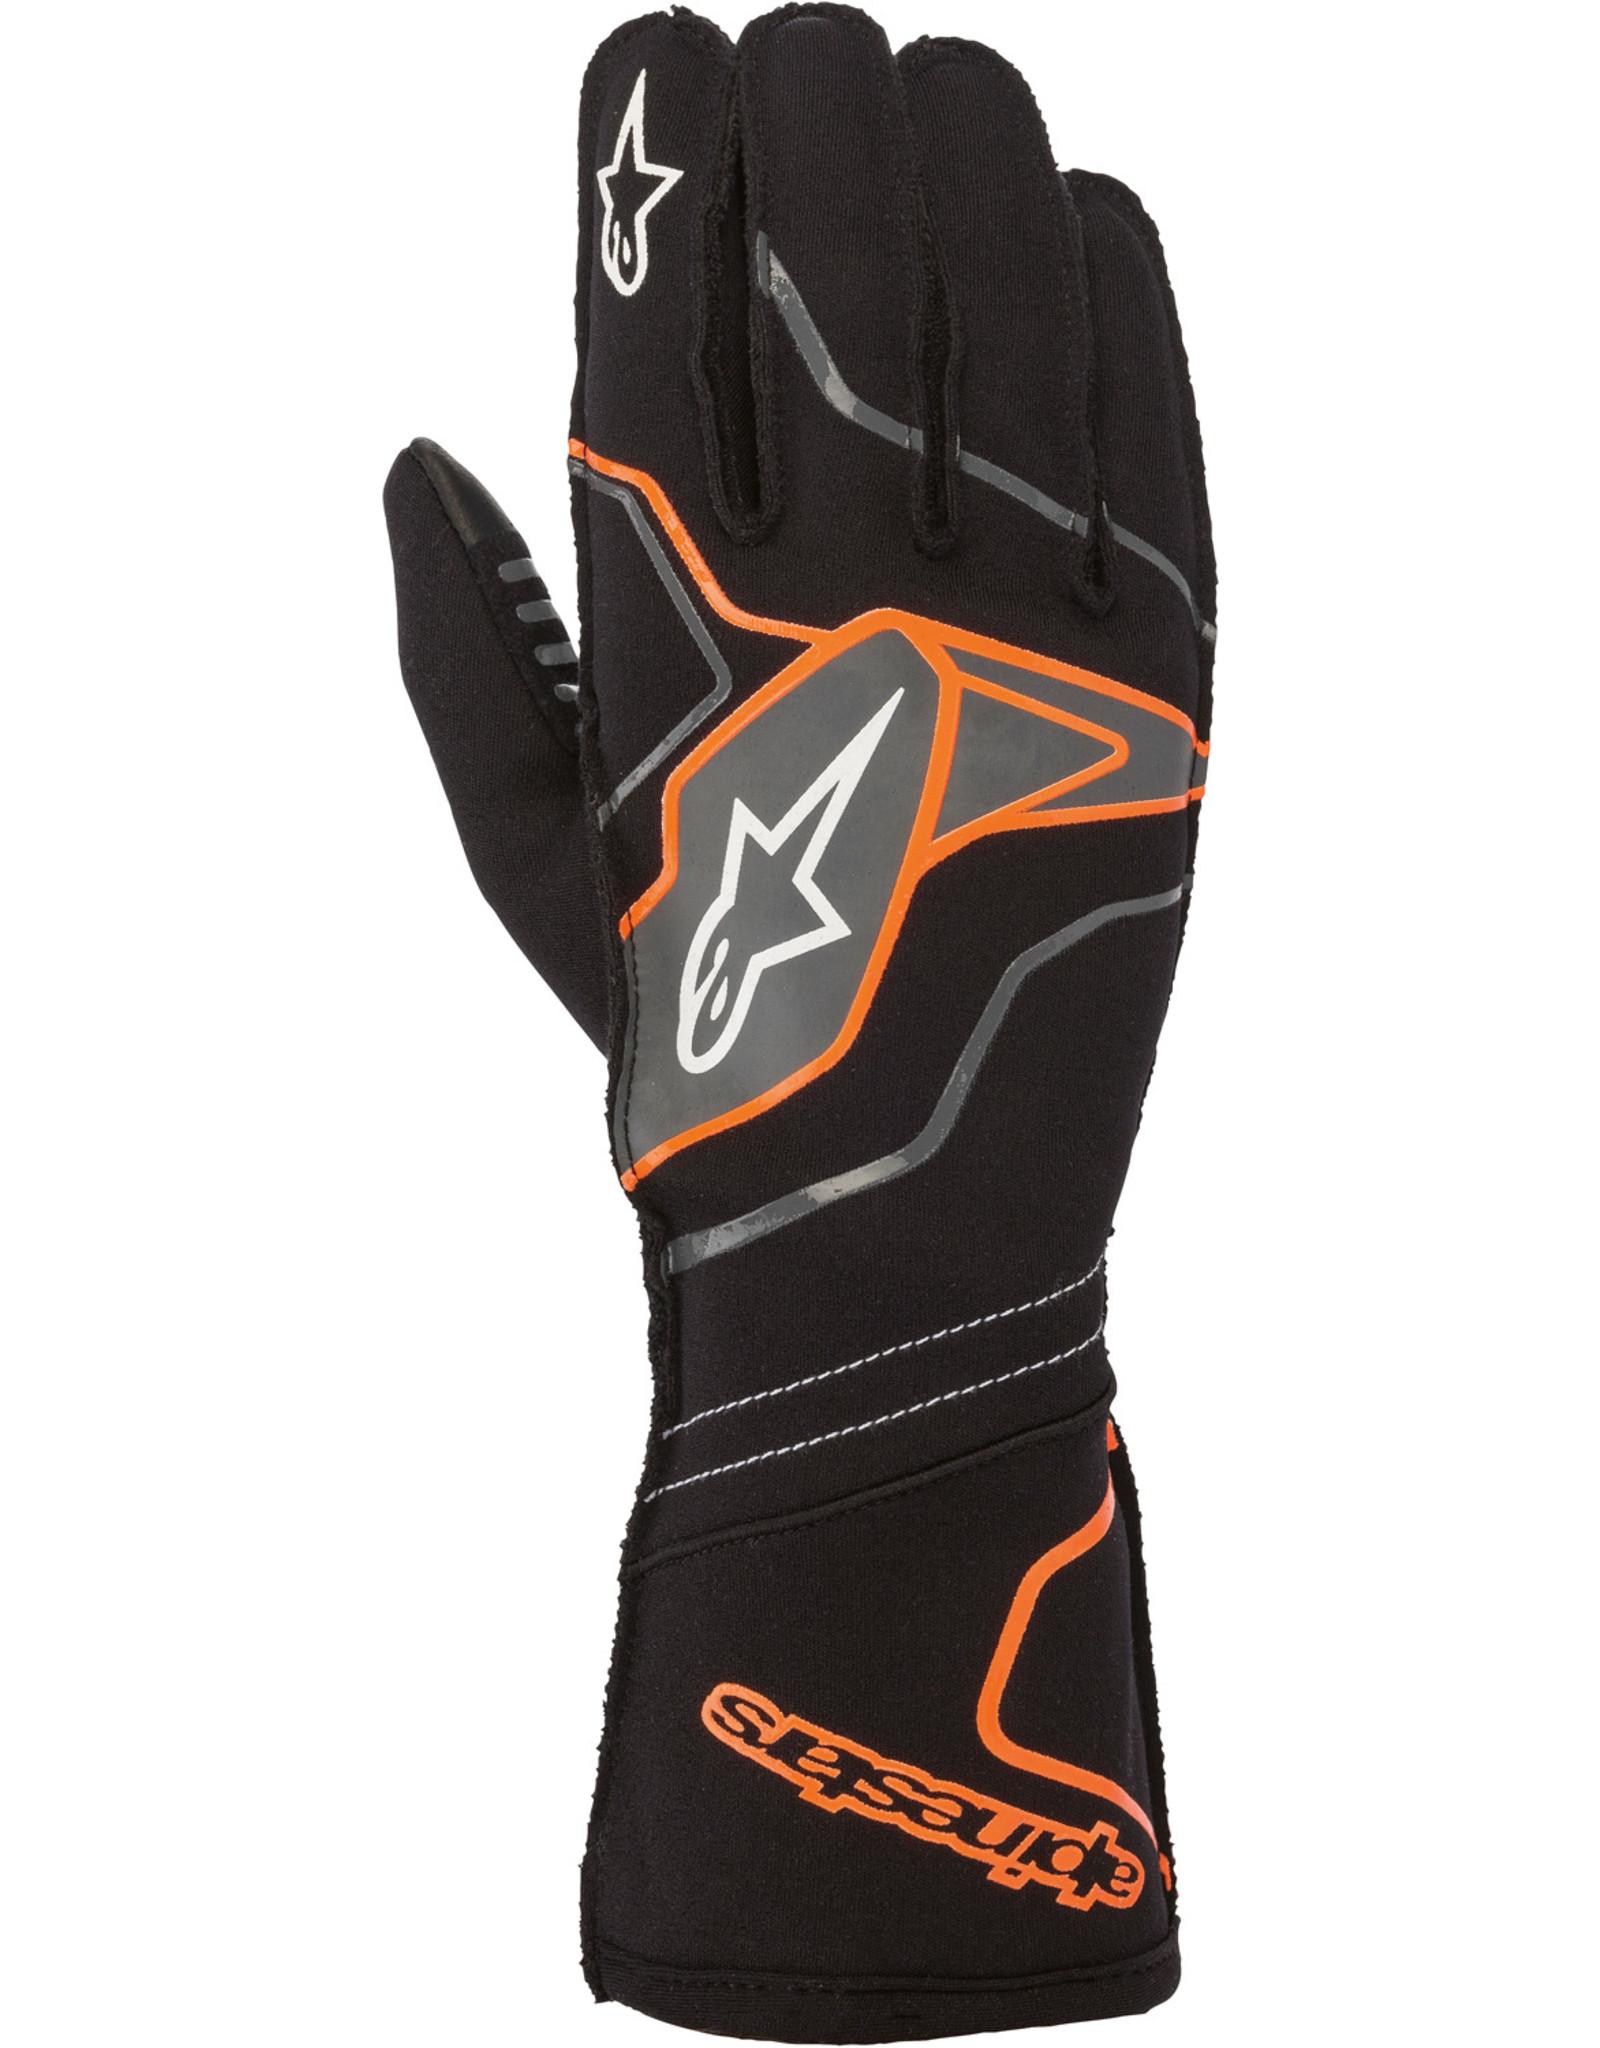 Alpinestars Alpinestars Tech 1 KX V2 zwart / Fluor oranje